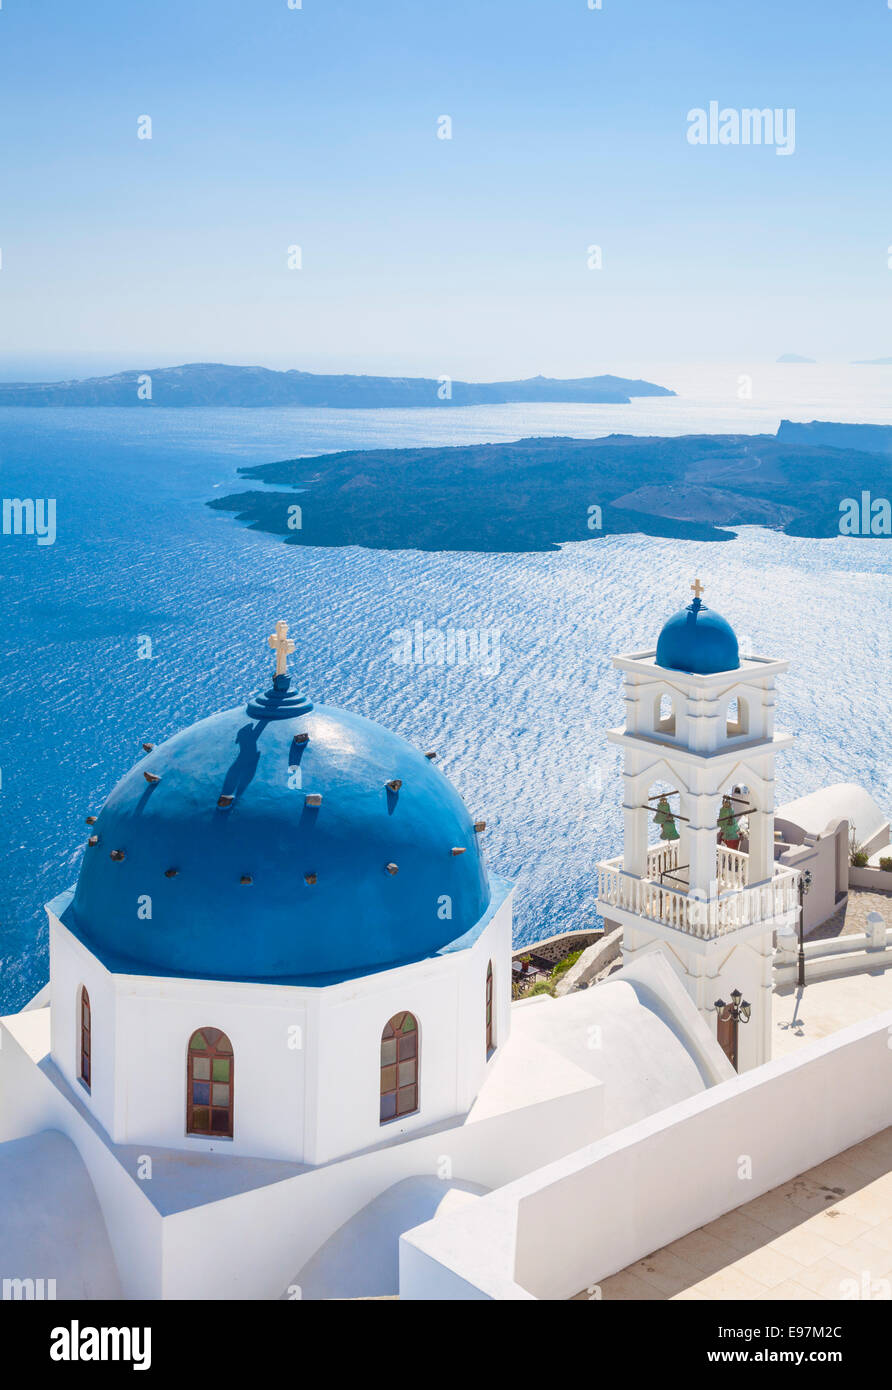 Anastasi Kirche in Imerovigli Santorini, Thira, Kykladen, griechische Inseln, Griechenland, EU, Europa Stockbild